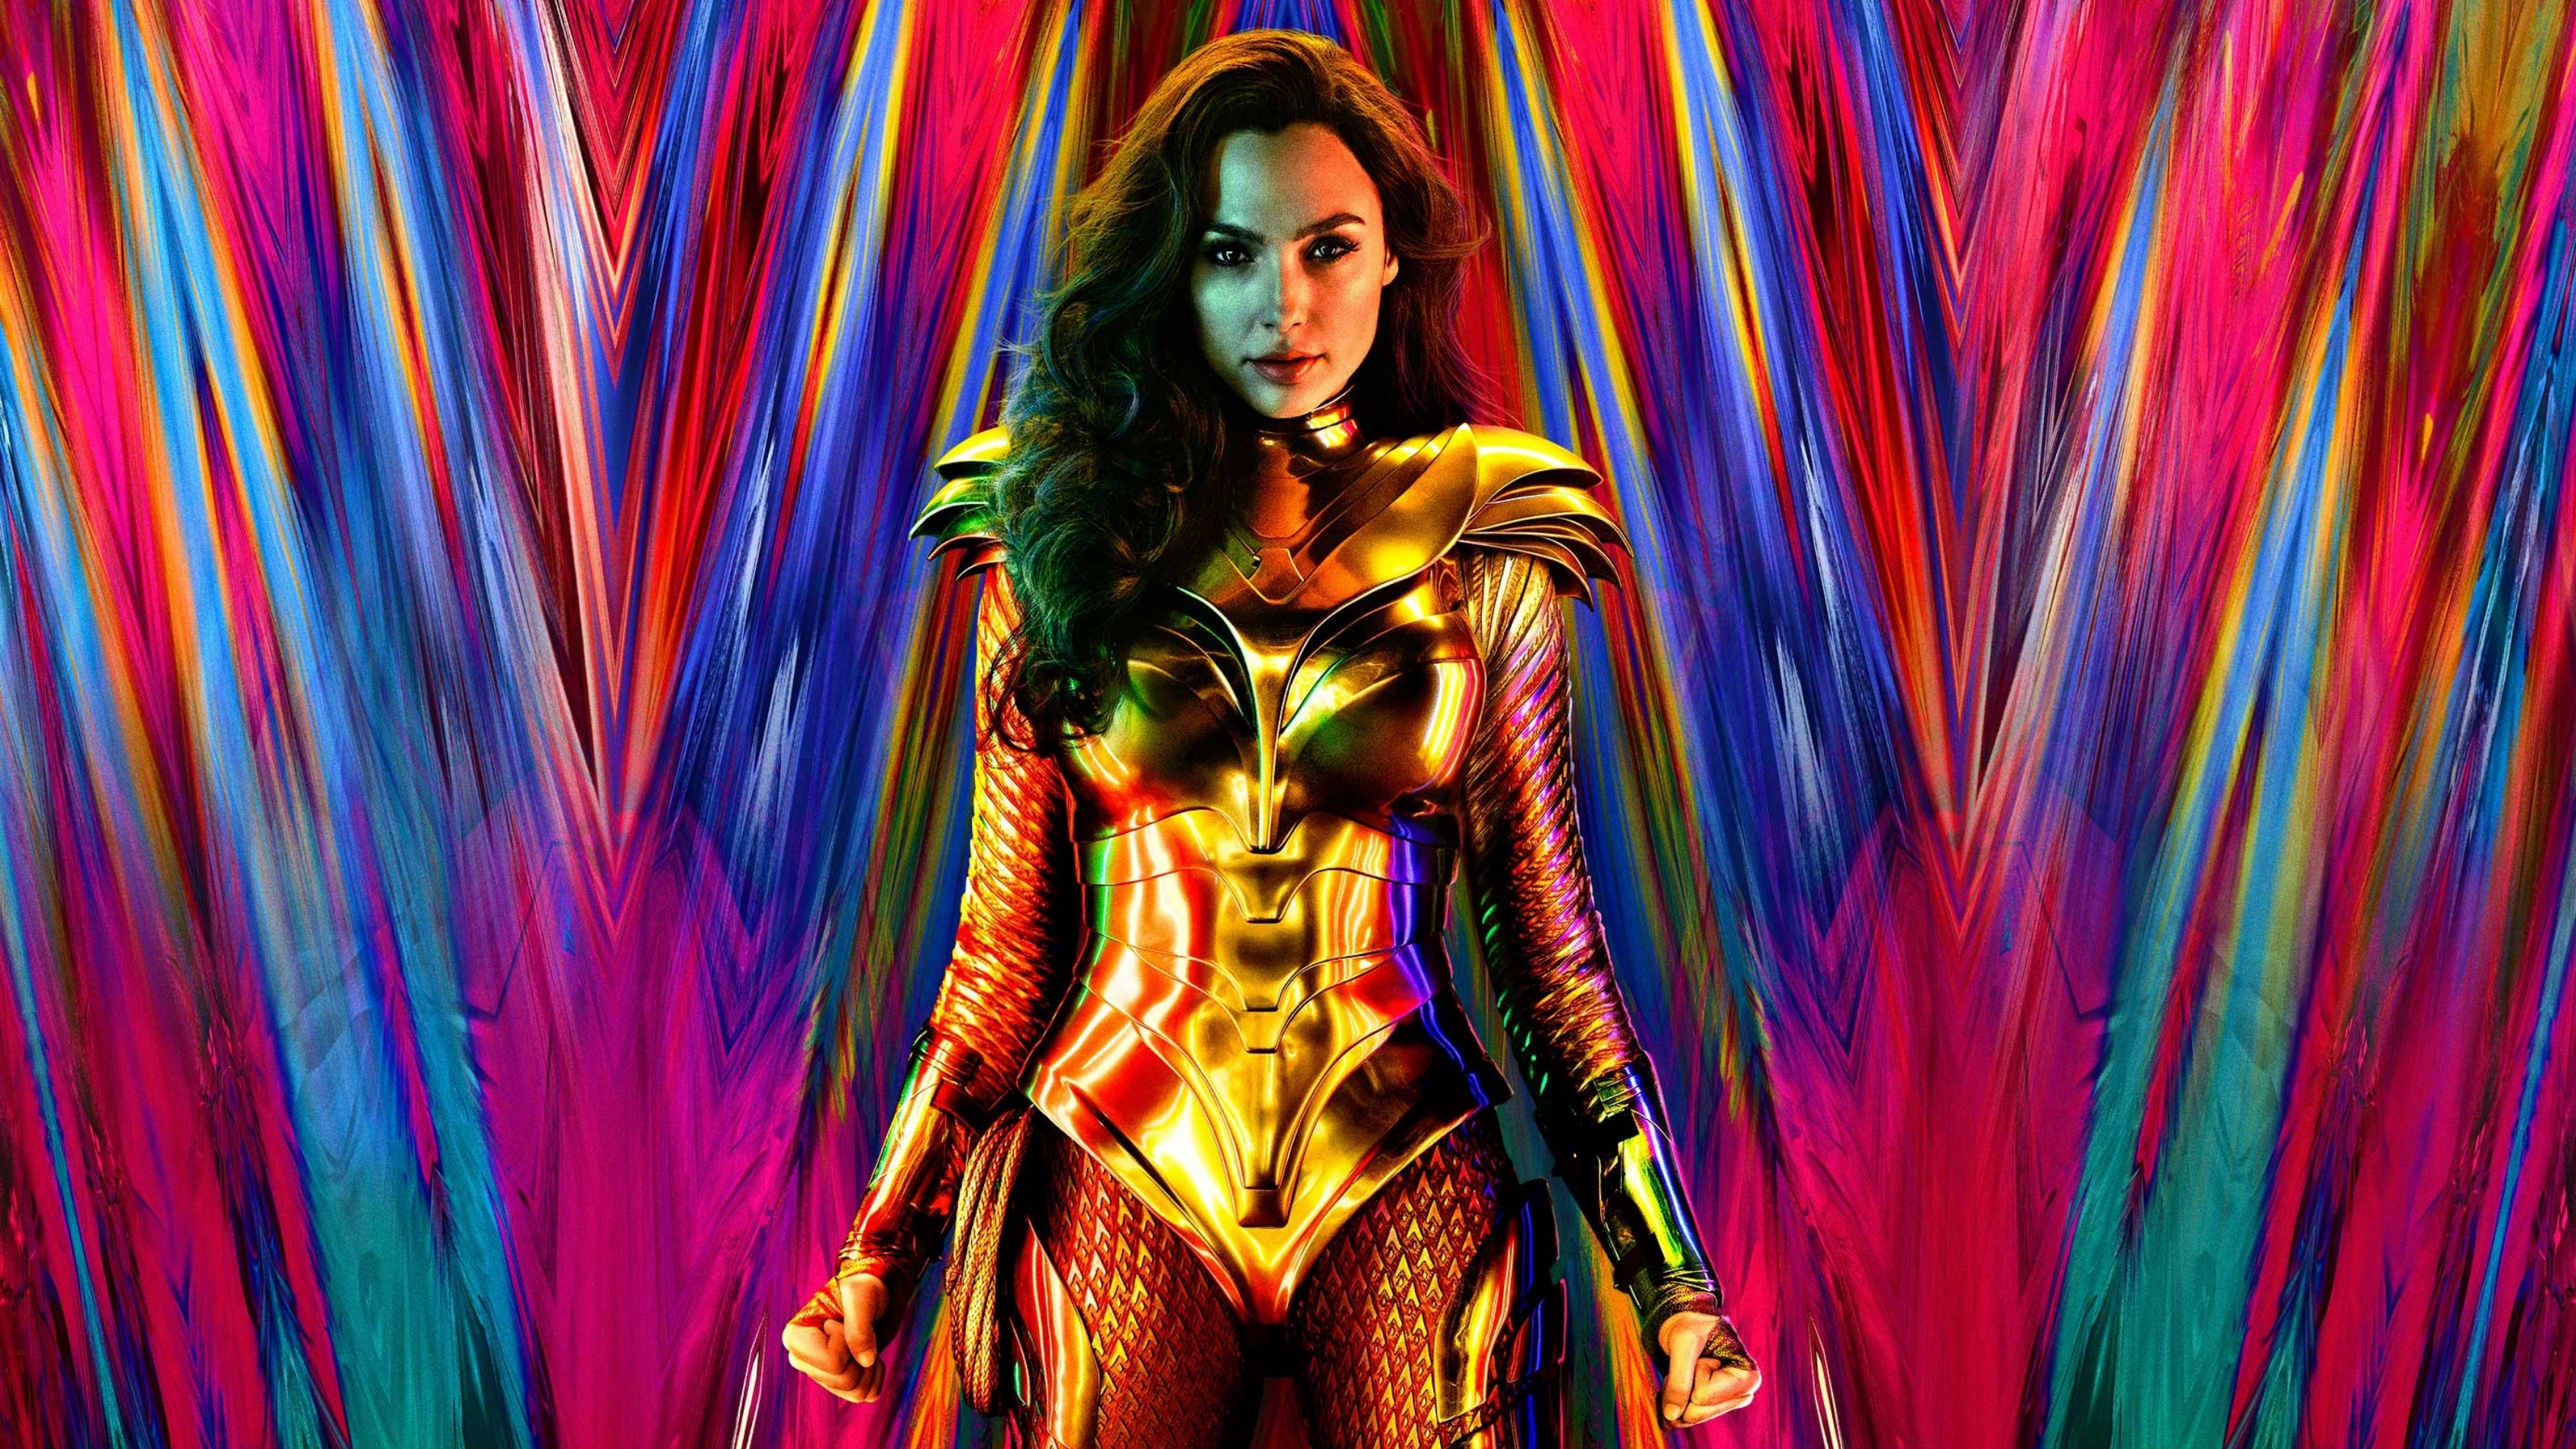 Wonder Woman 1984 4k Hd Movies 4k Wallpapers Images